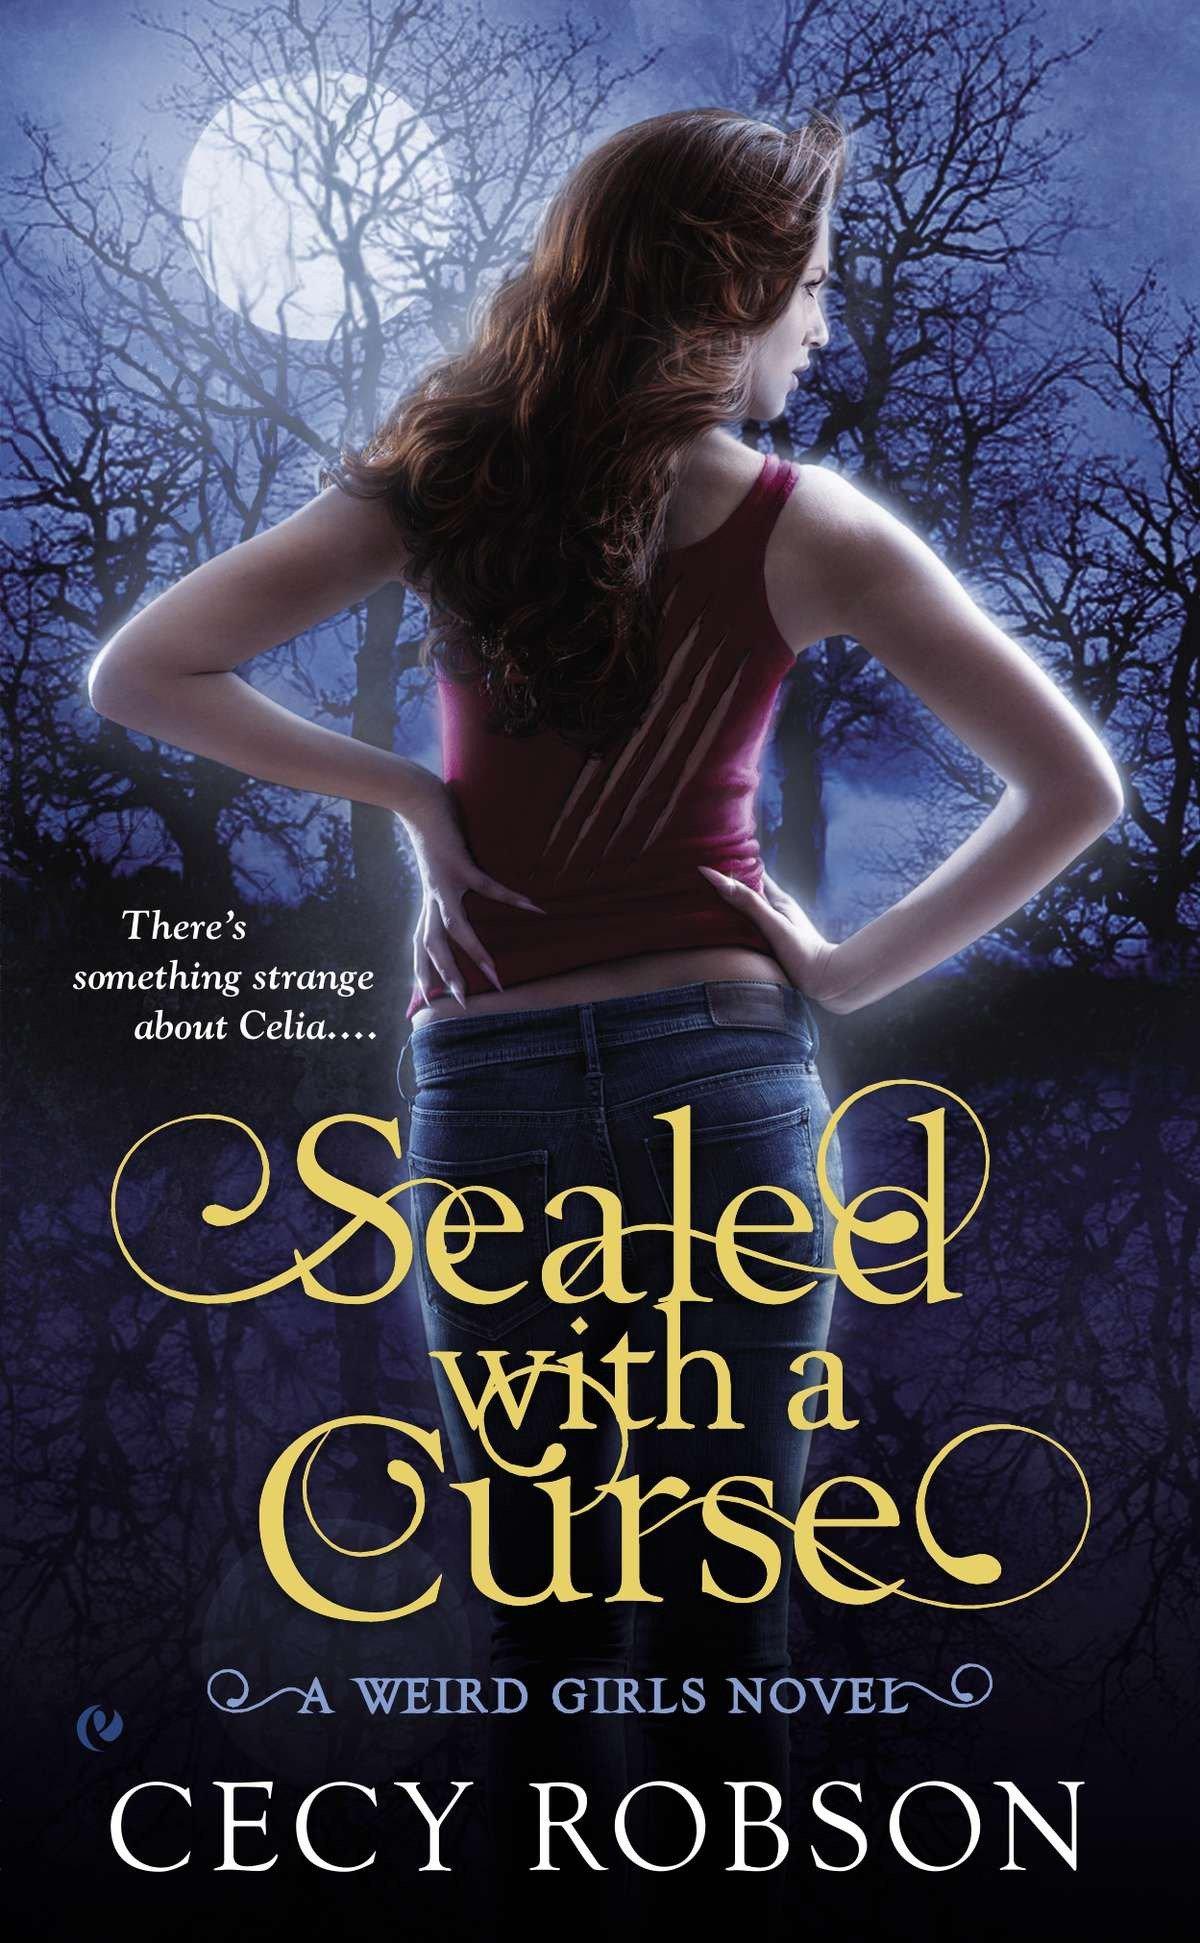 Amazon.com: Sealed with a Curse: A Weird Girls Novel (9780451416735): Cecy  Robson: Books